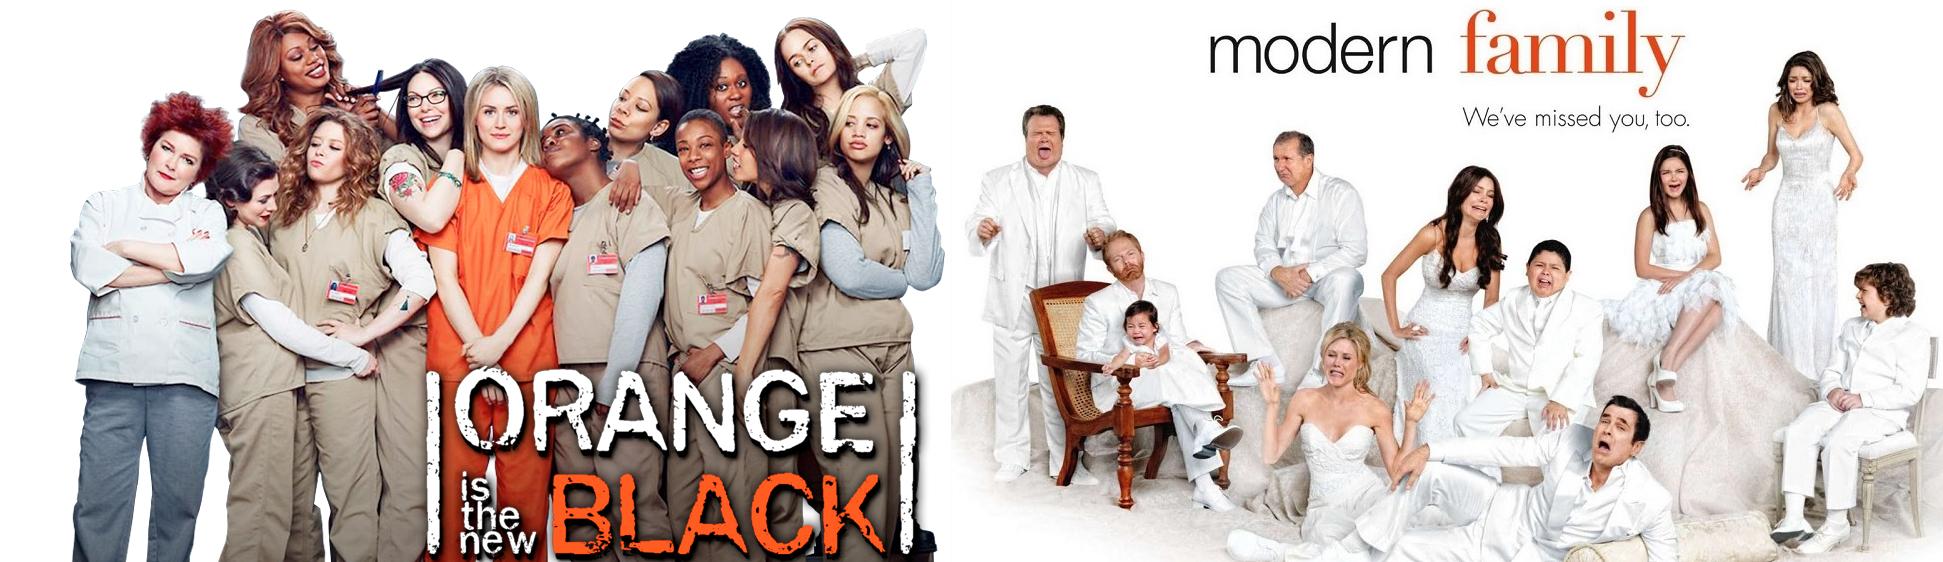 Orange_is_the_new_orange_Moder_Family_Emmy_MC